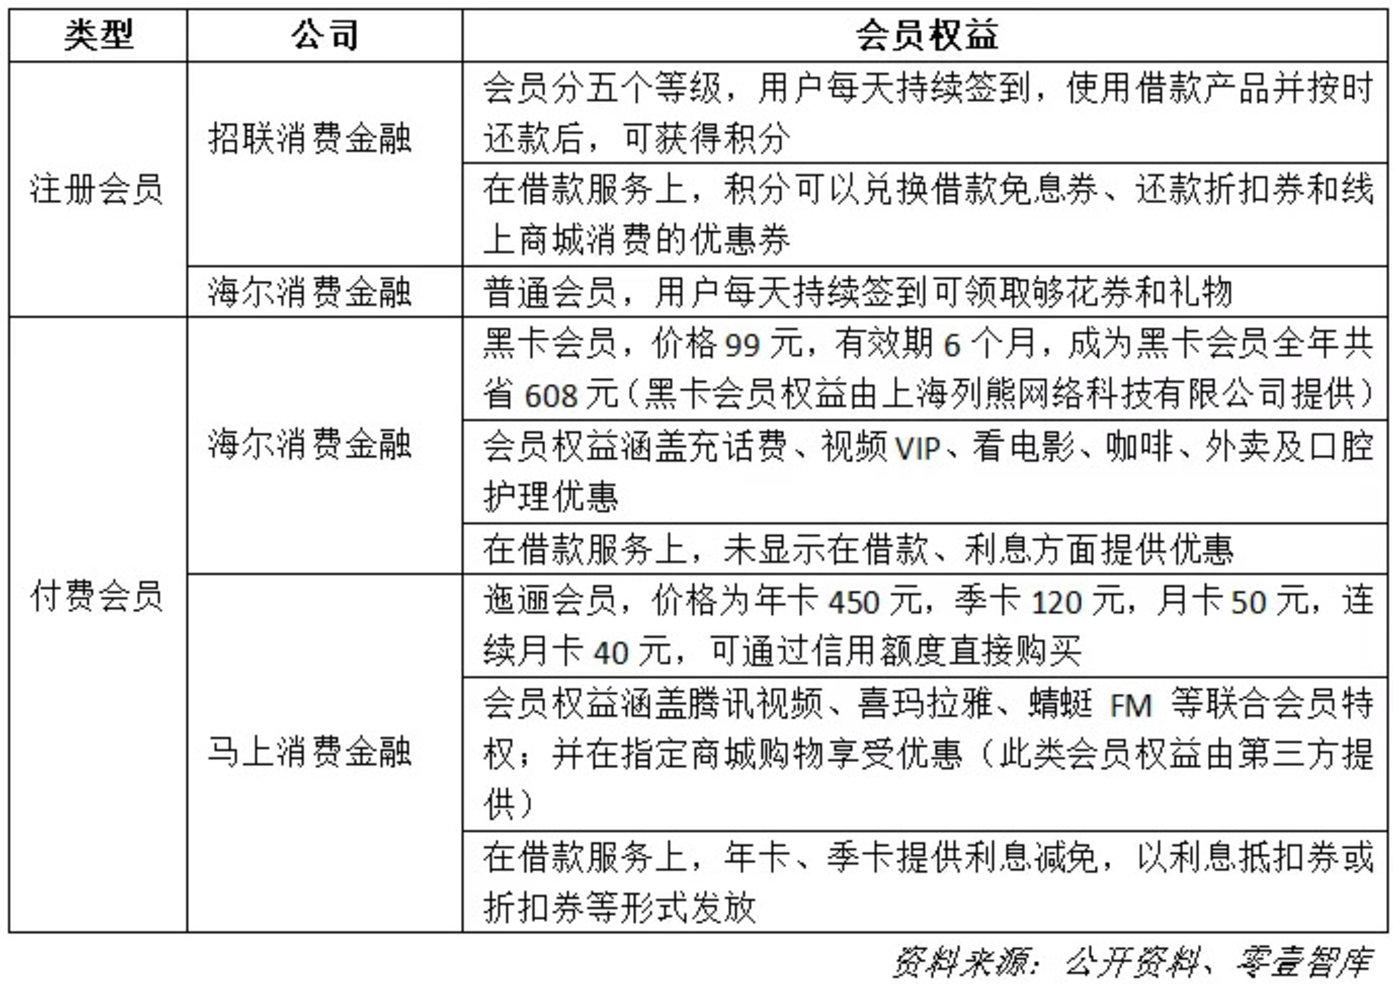 www.pj550066.com 贵人鸟遭质疑虚增收入:应收账款占比畸高 上演关店潮